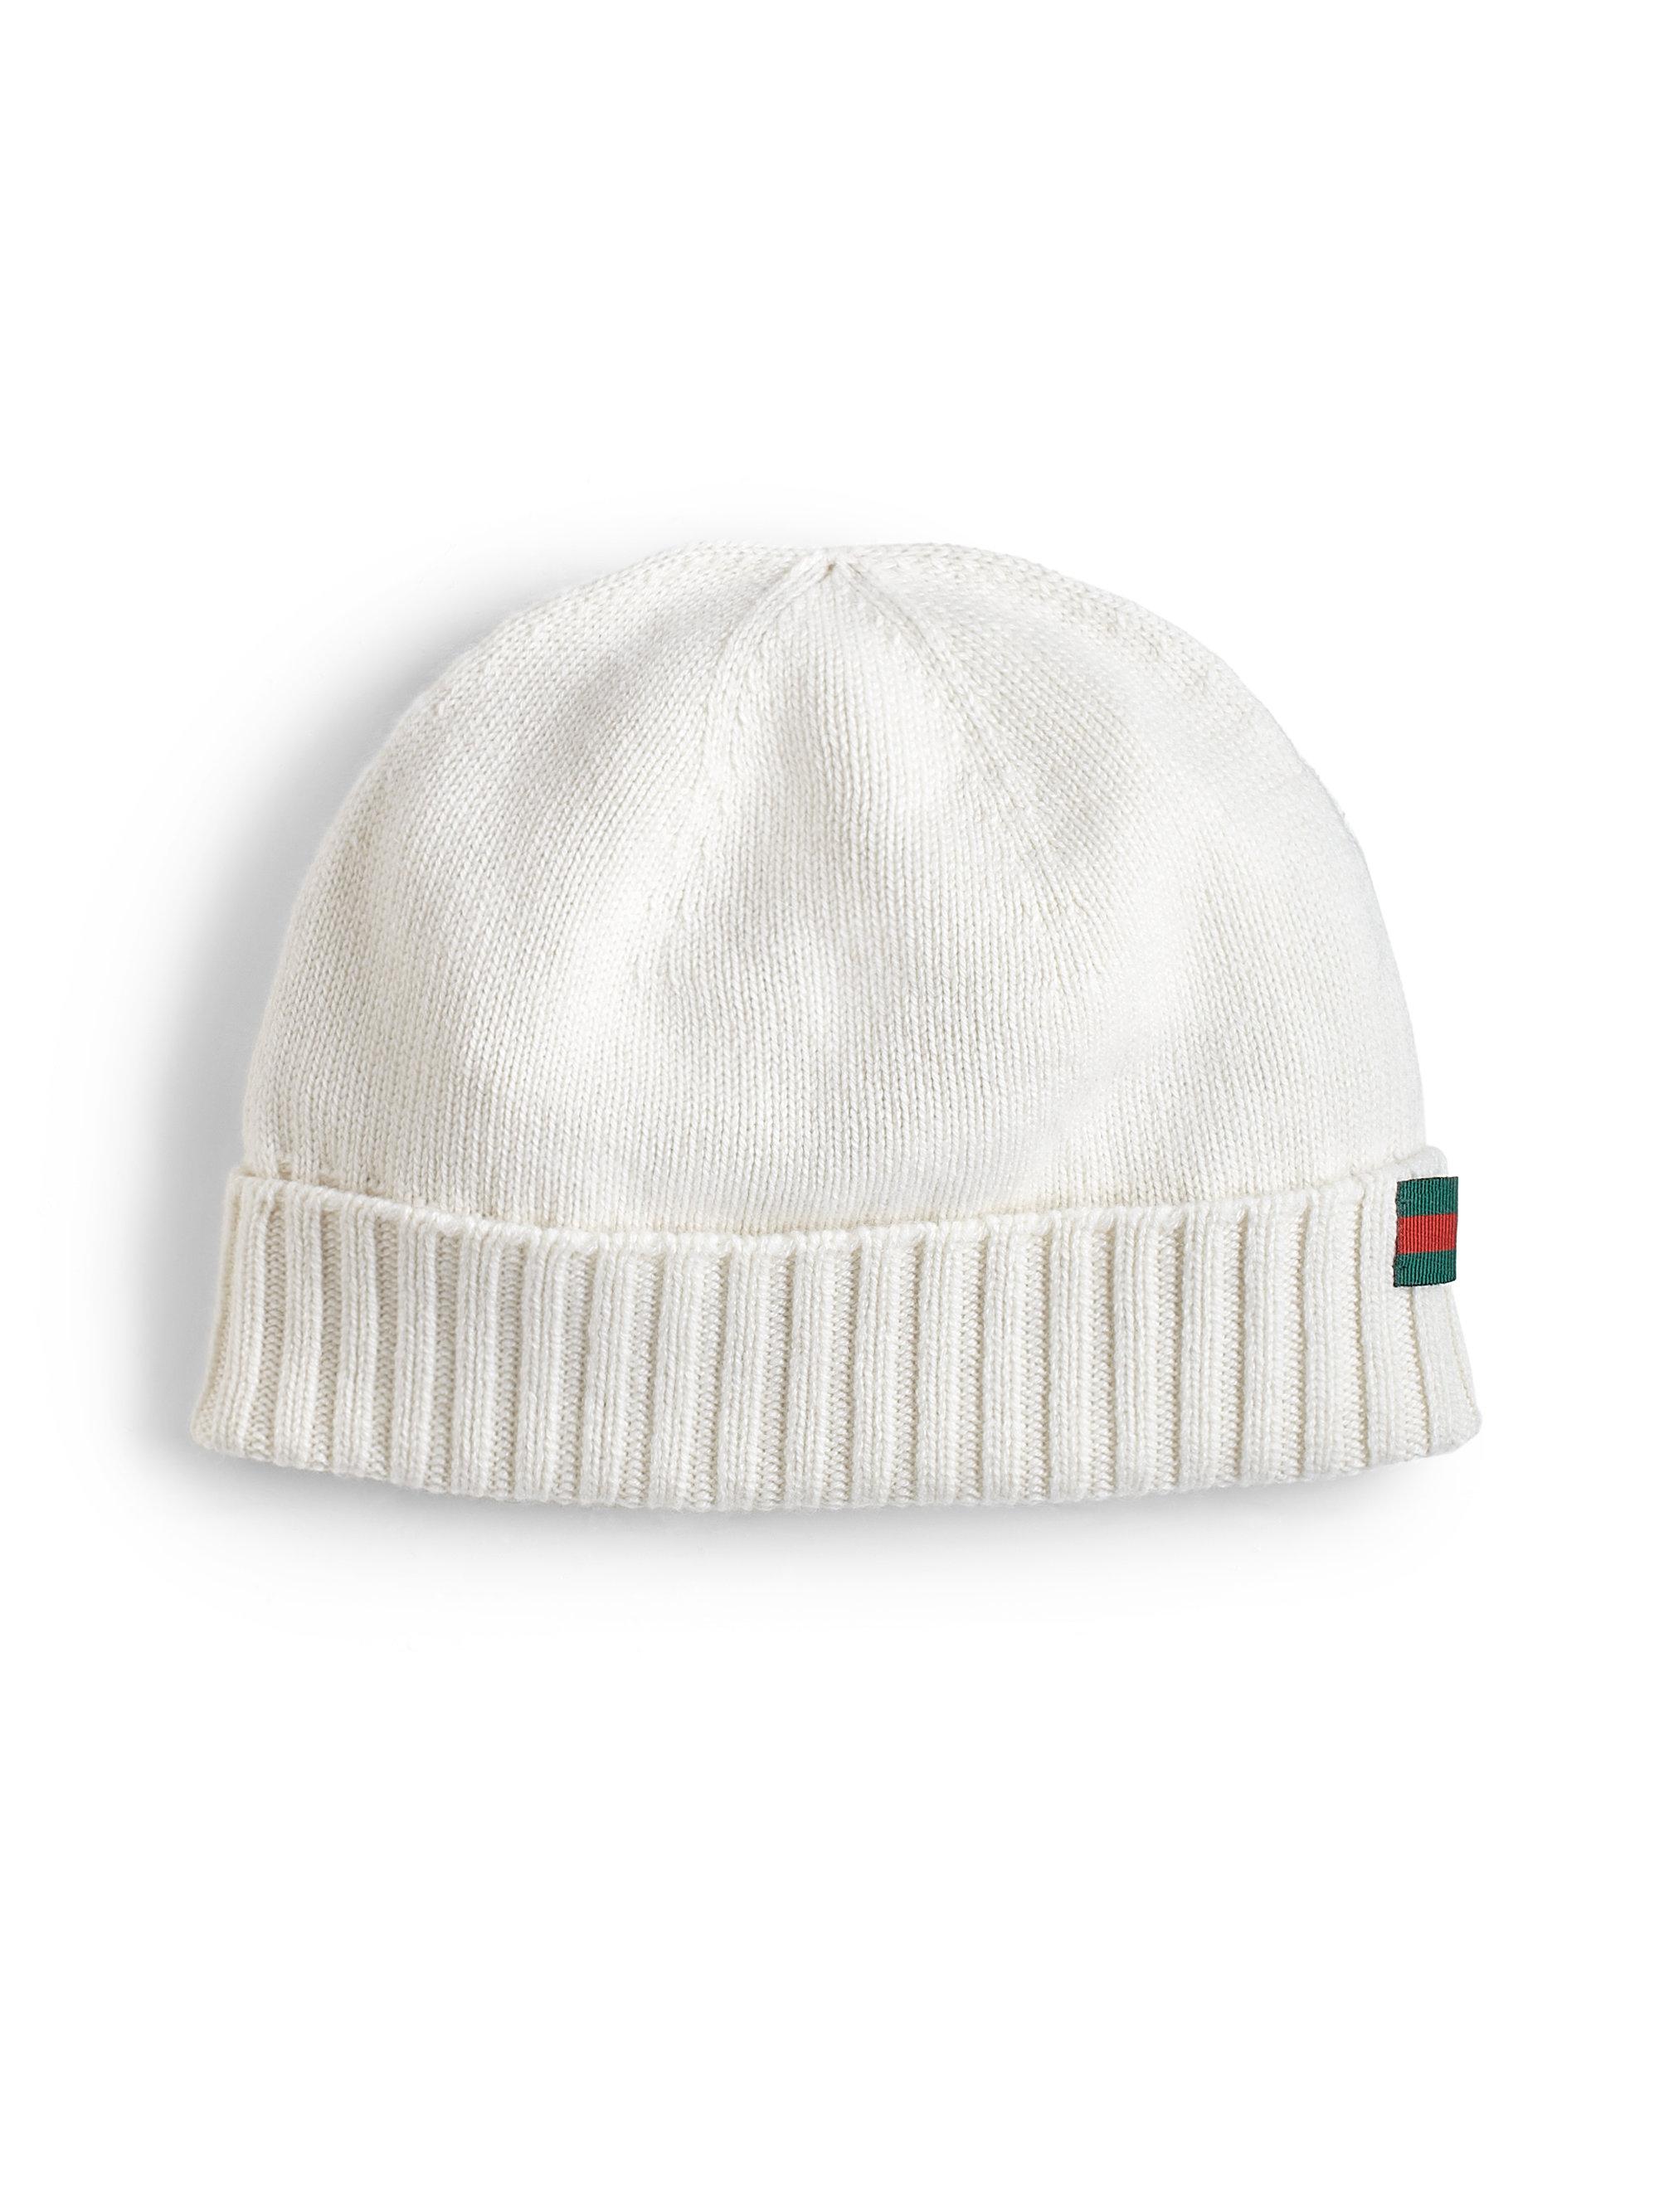 609fca37b2e7 Gucci Cashmere Beanie Hat in White for Men - Lyst